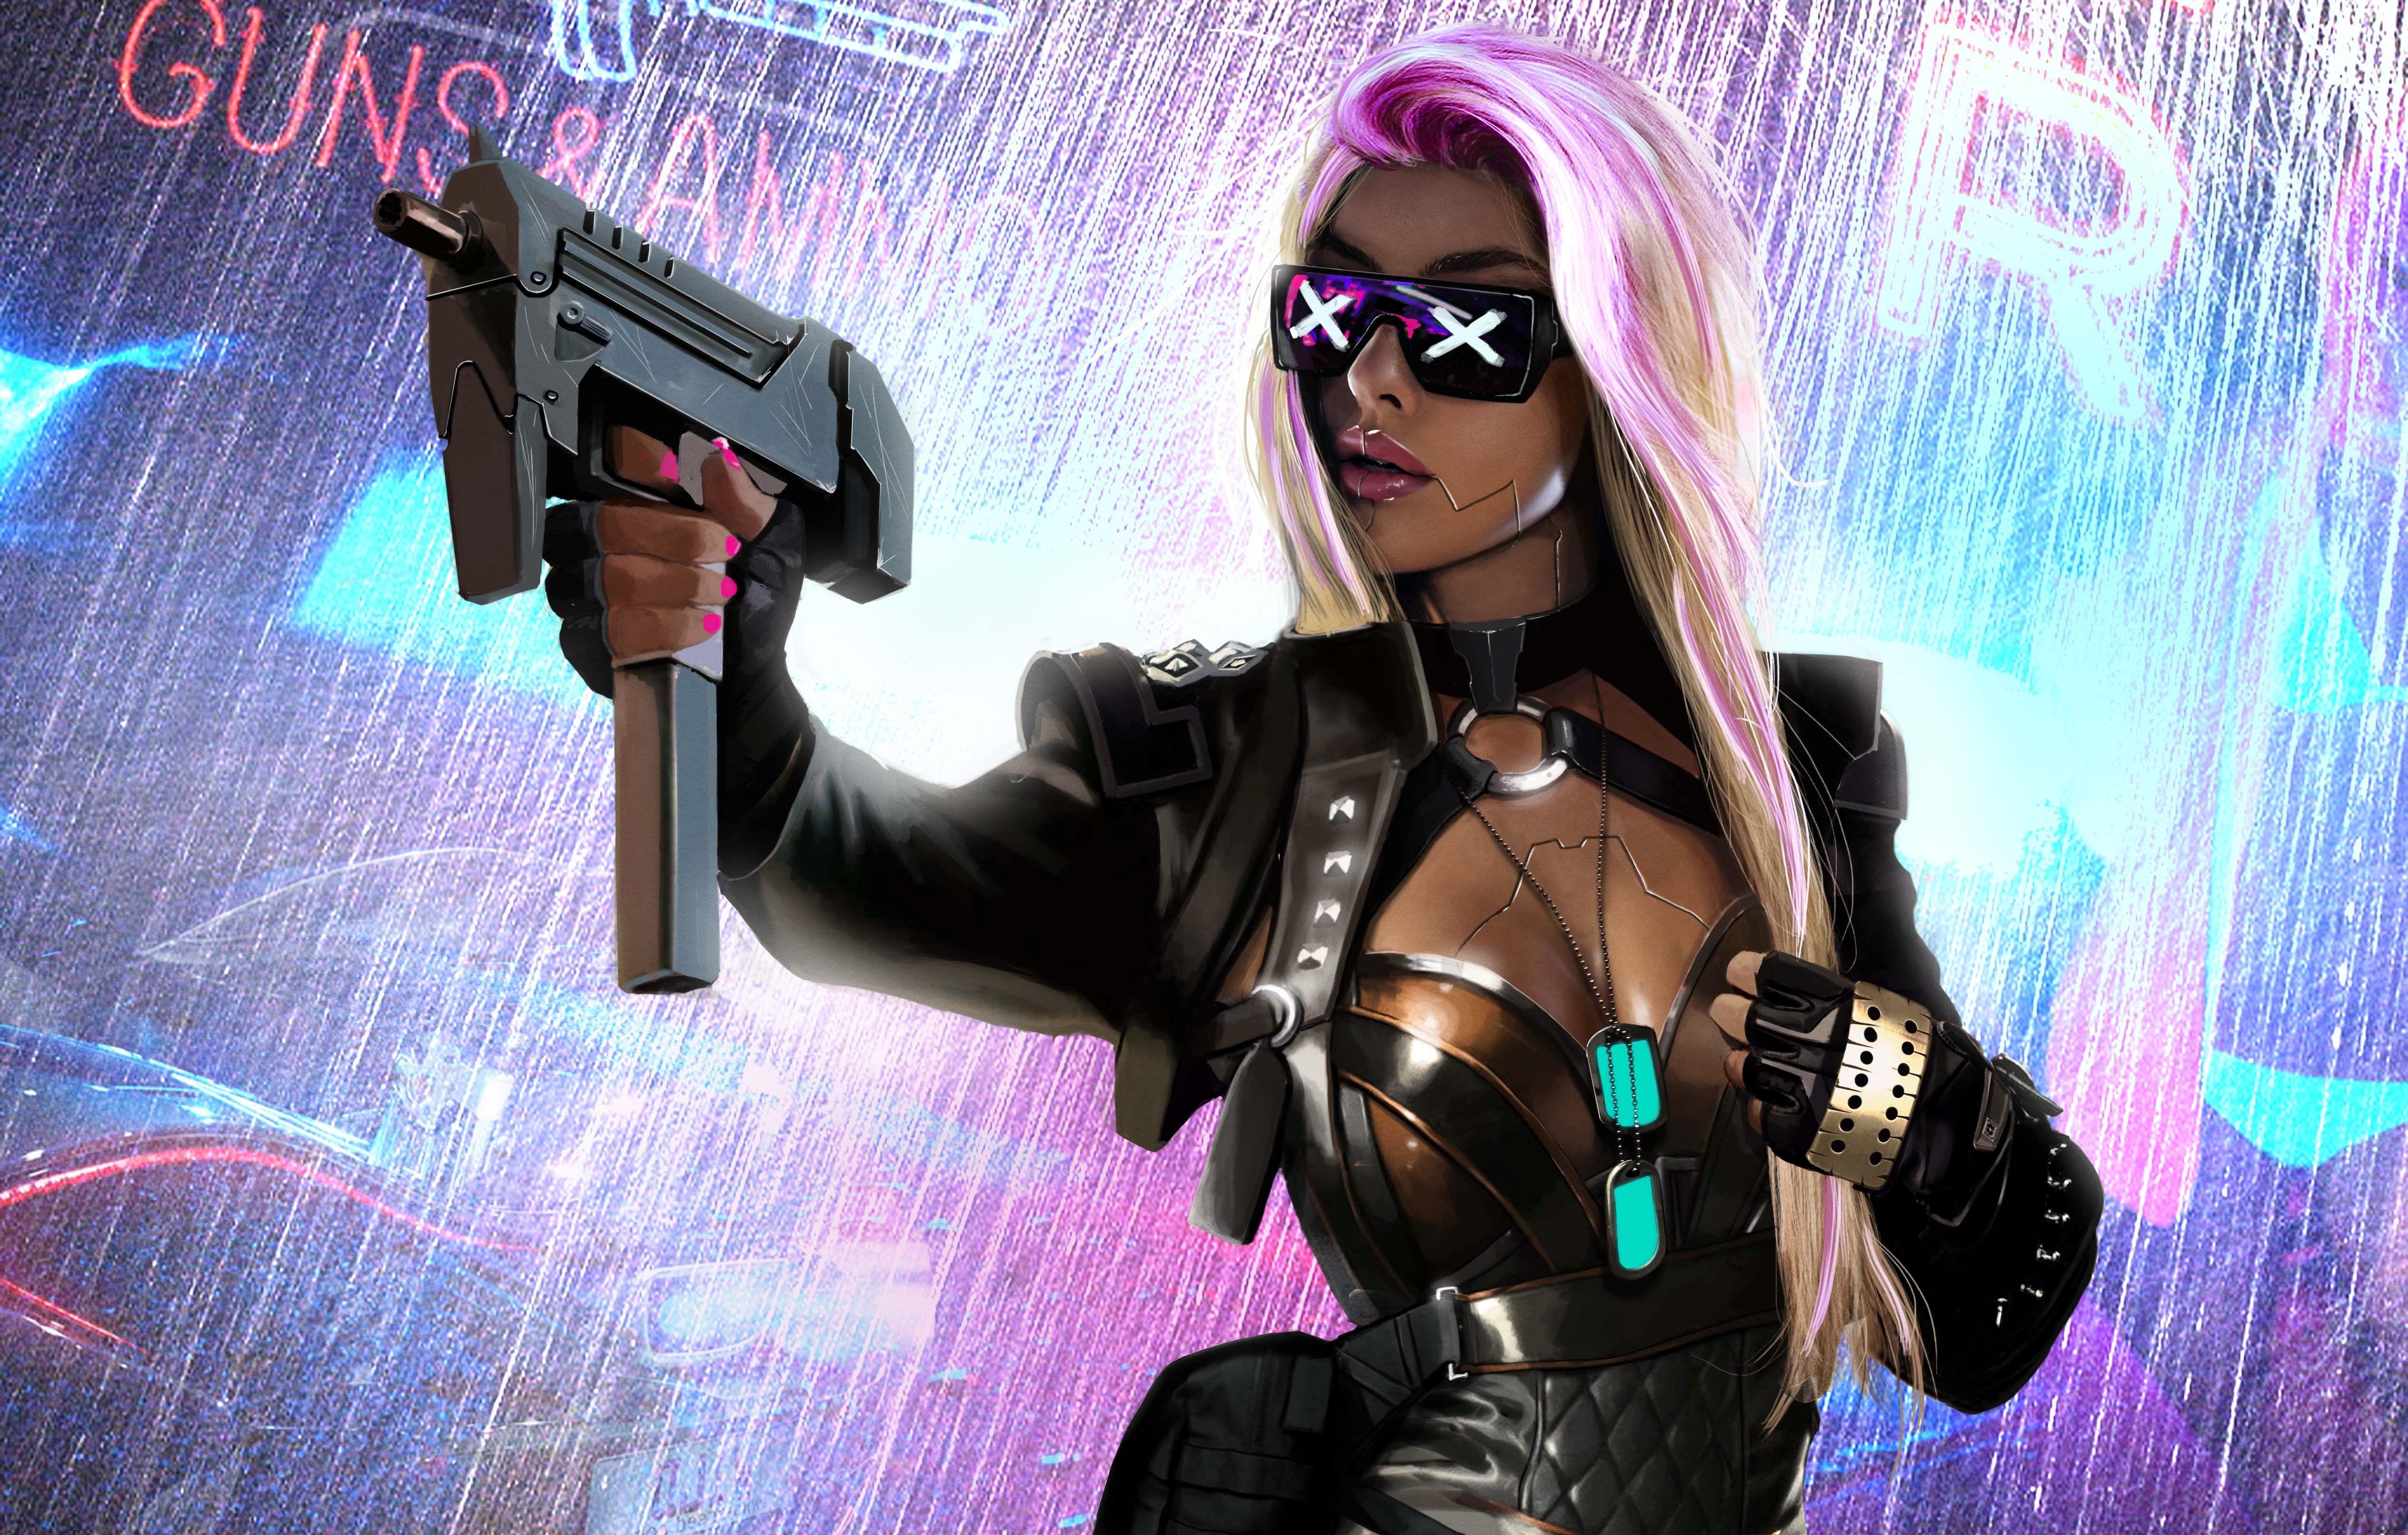 Cyberpunk Scifi Girl 5k, HD Artist, 4k Wallpapers, Images ...